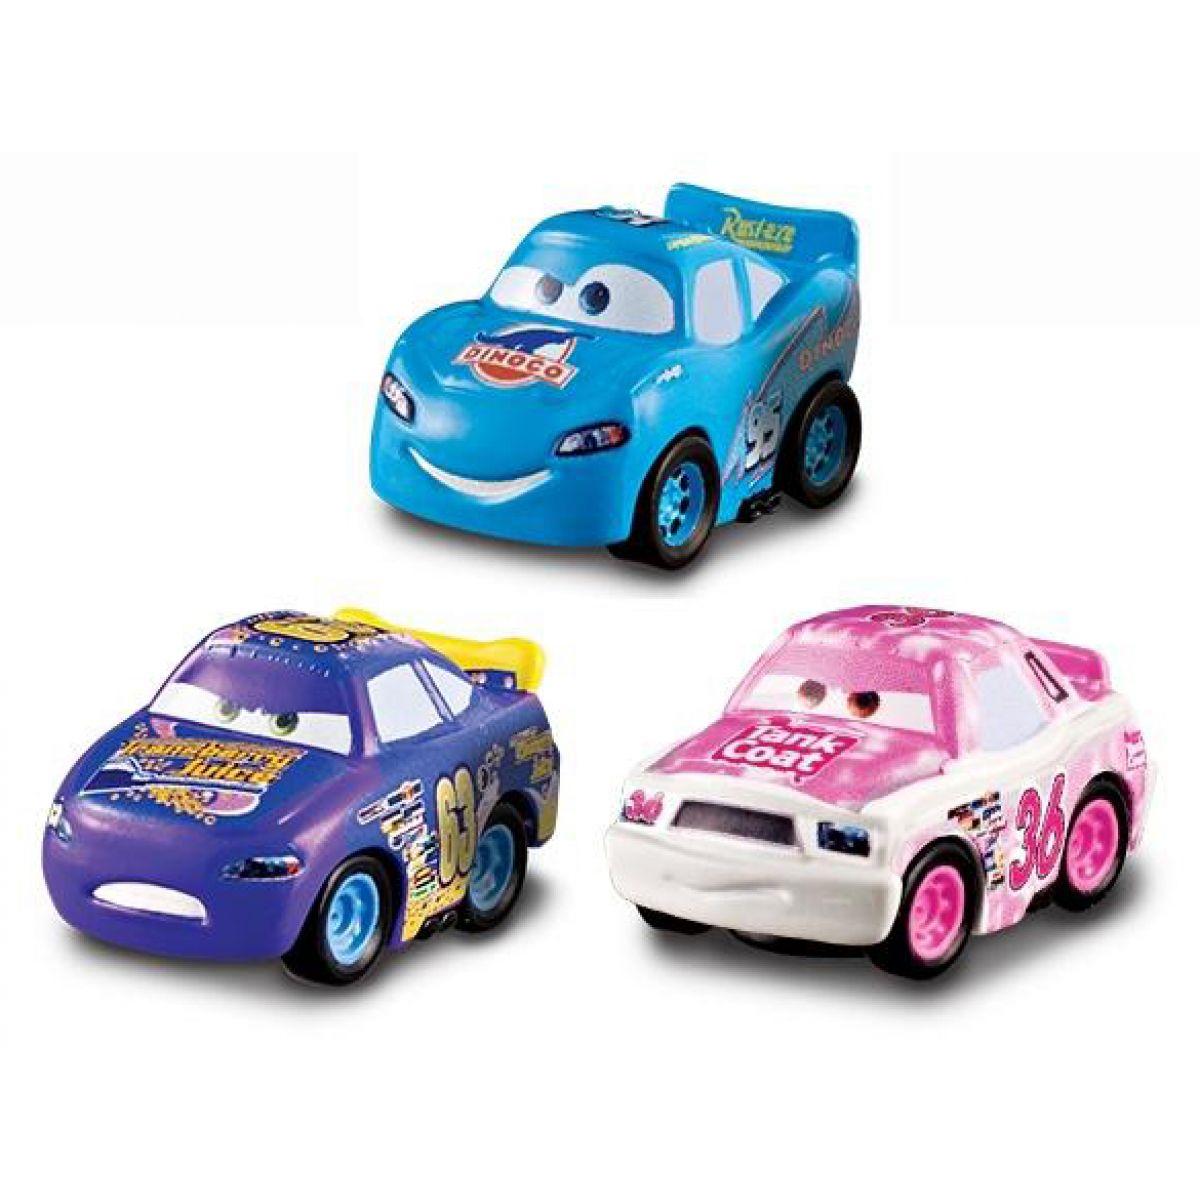 Mattel Cars Micro Drifters 3ks - Tank Coat, Bling McQueen, Transberry Juice